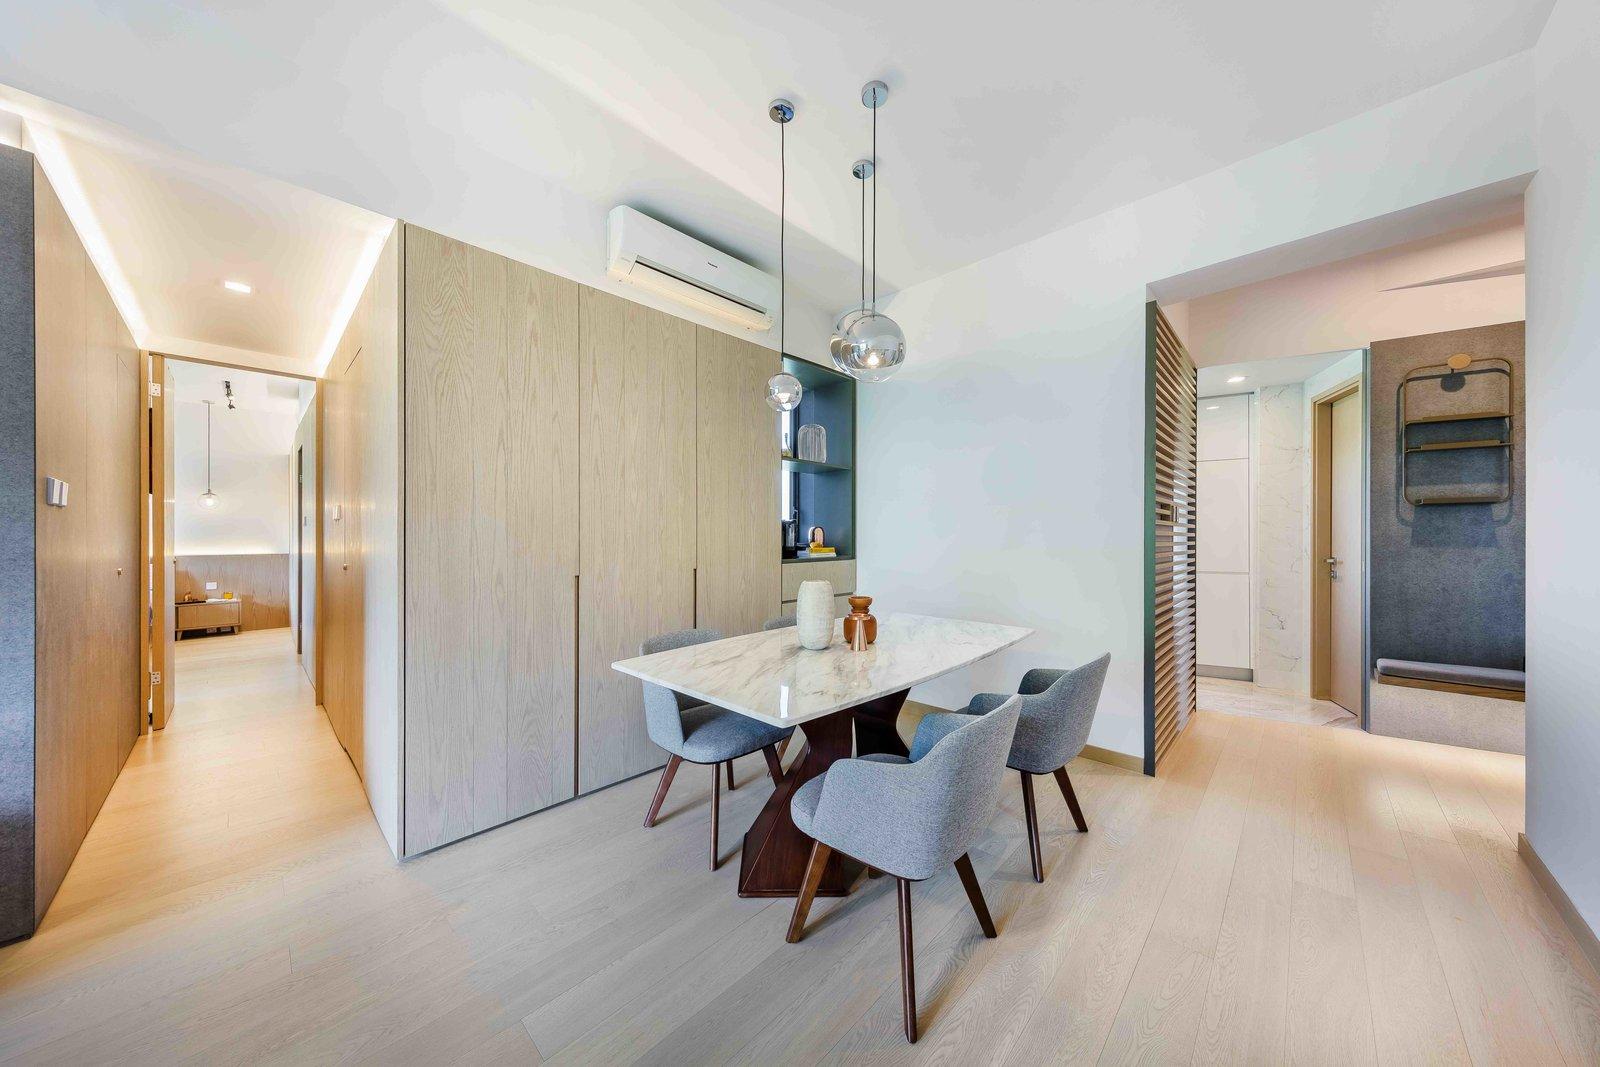 Hong Kong Interior Designers: Our Top 10 Modern Chairs hong kong interior designers Hong Kong Interior Designers: Our Top 10 Modern Chairs Hong Kong Interior Designers Our Top 10 Modern Chairs 10